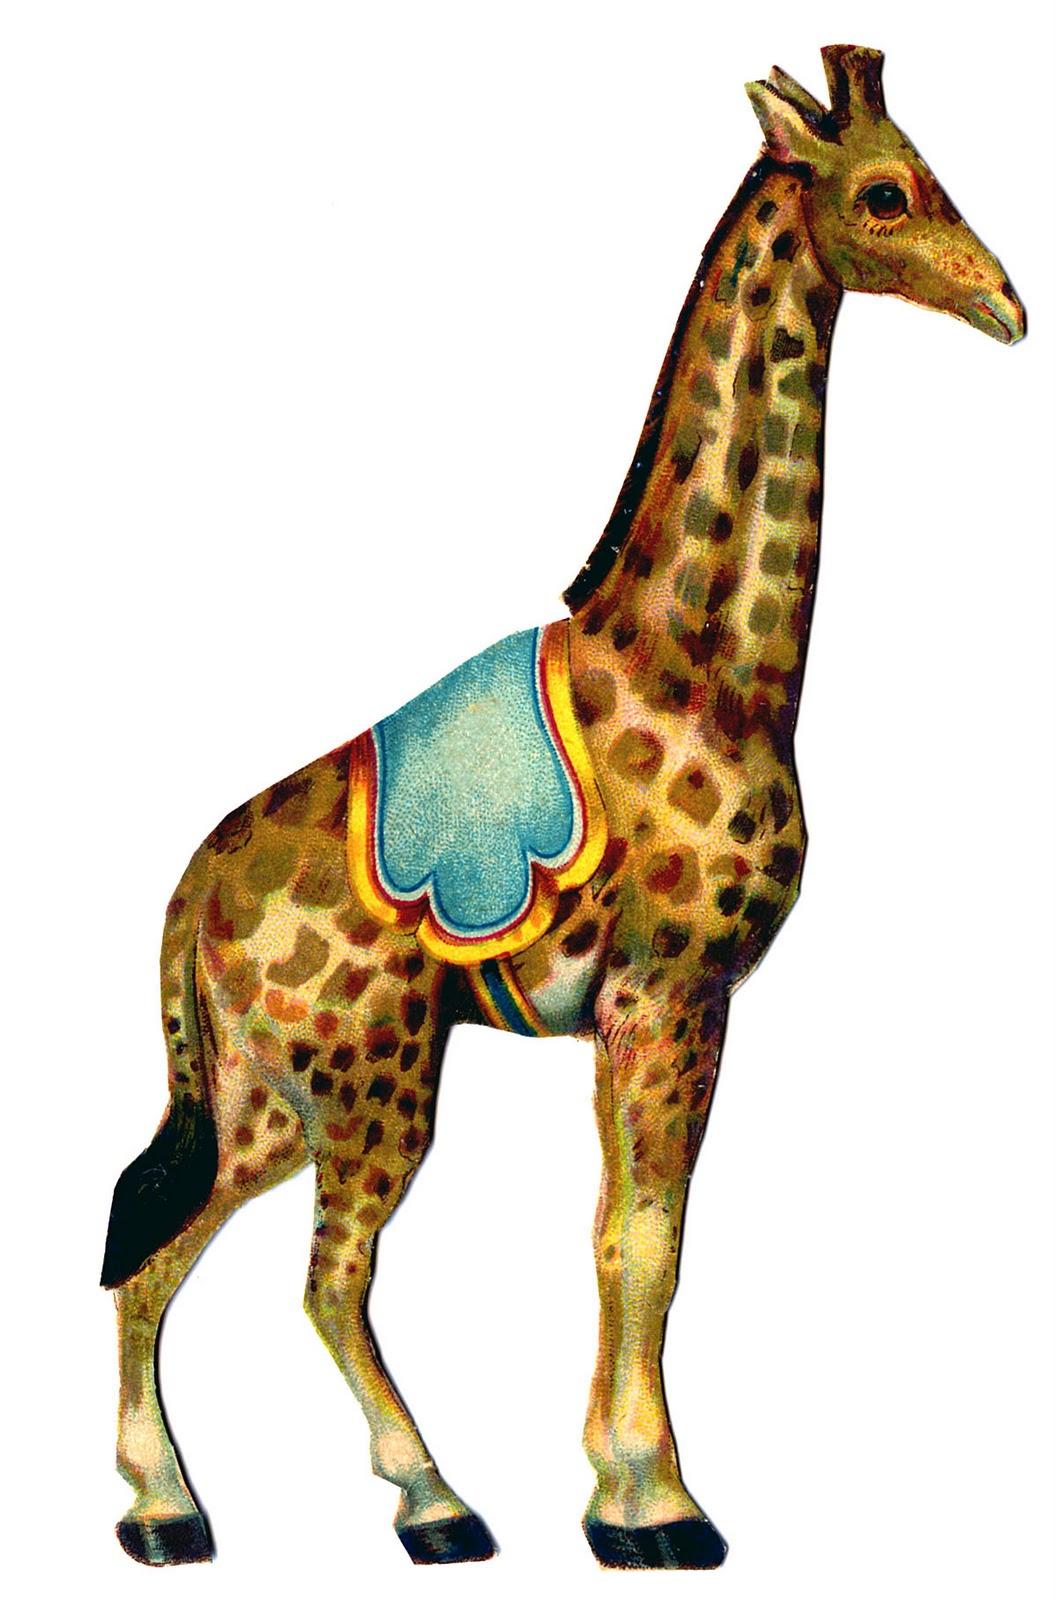 Vintage Graphic - Circus Giraffe - The Graphics Fairy